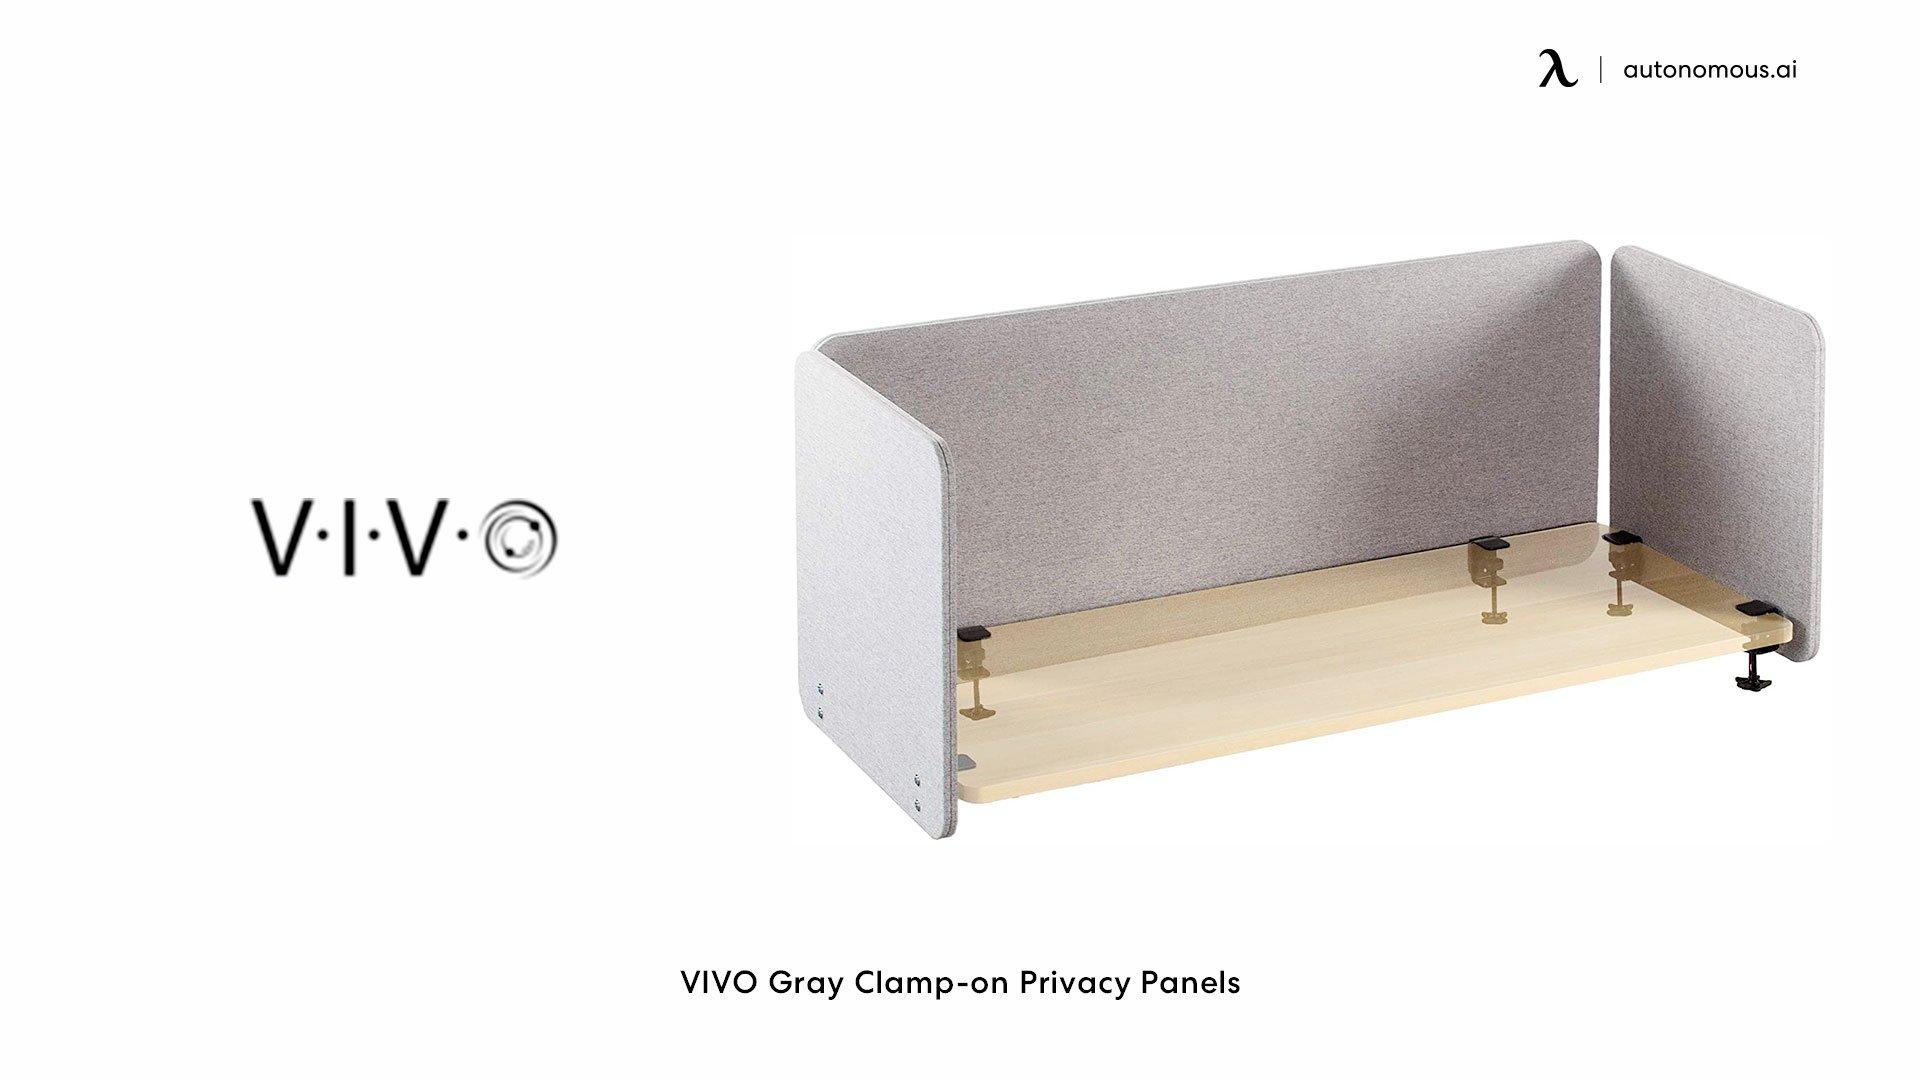 VIVO Gray Clamp-on Privacy Panels